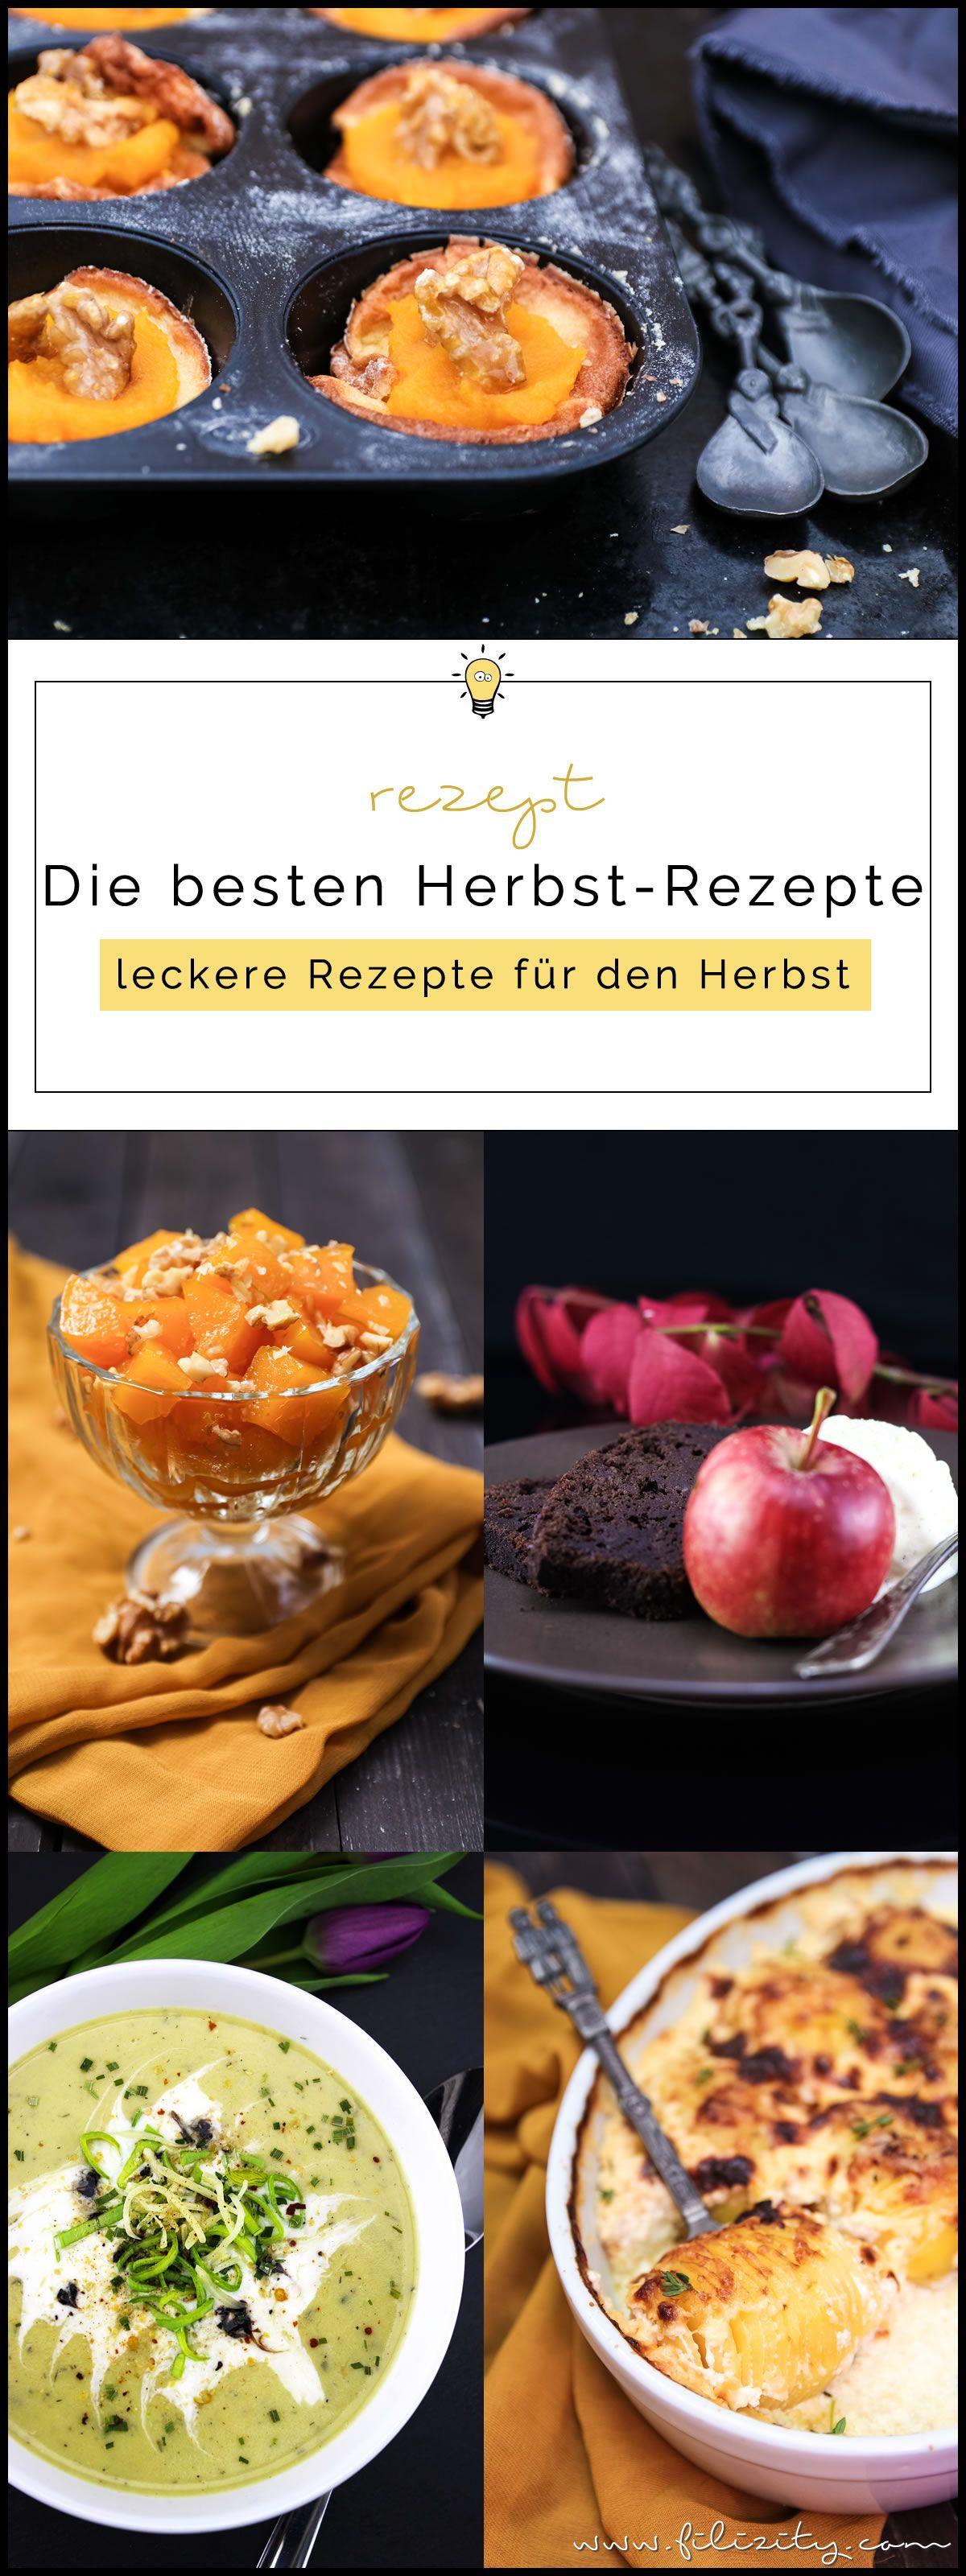 Die besten Herbst-Rezepte | Filizity. Kreativmagazin & Foodblog